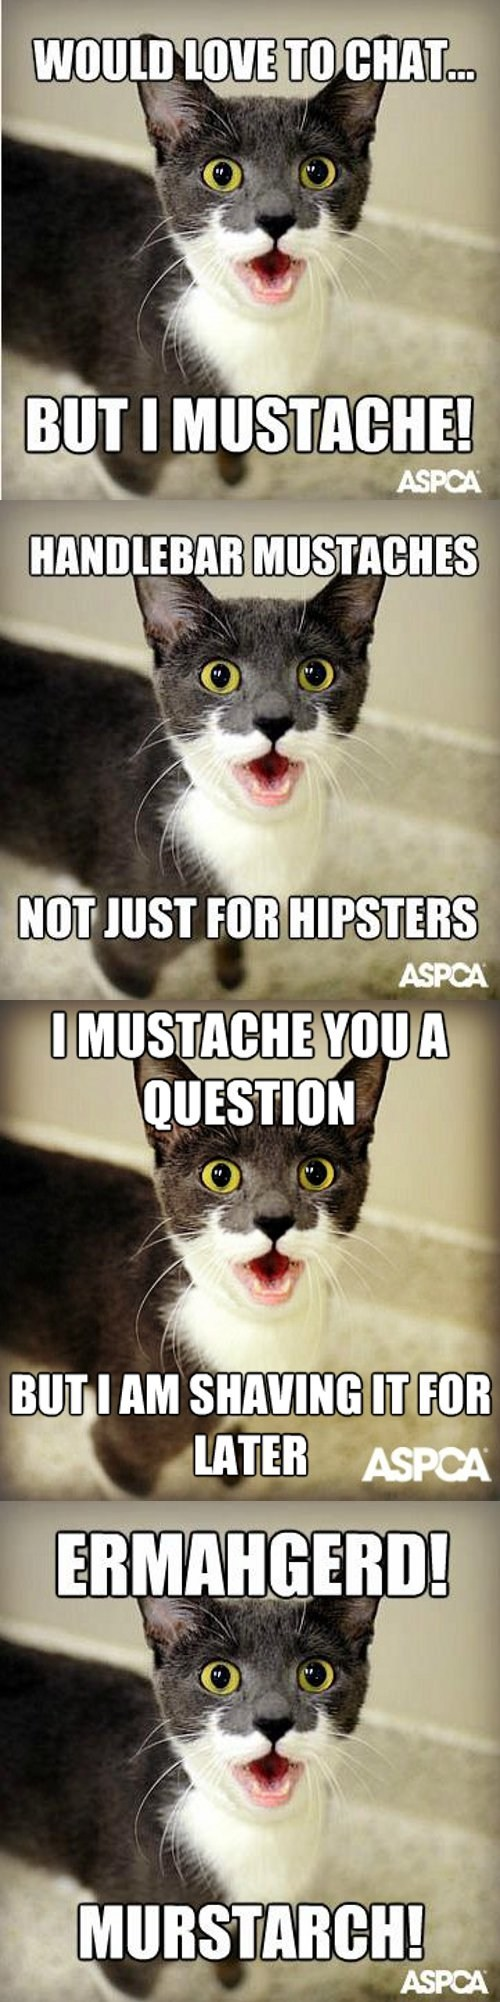 mustache meme nory Cats - 7230246912